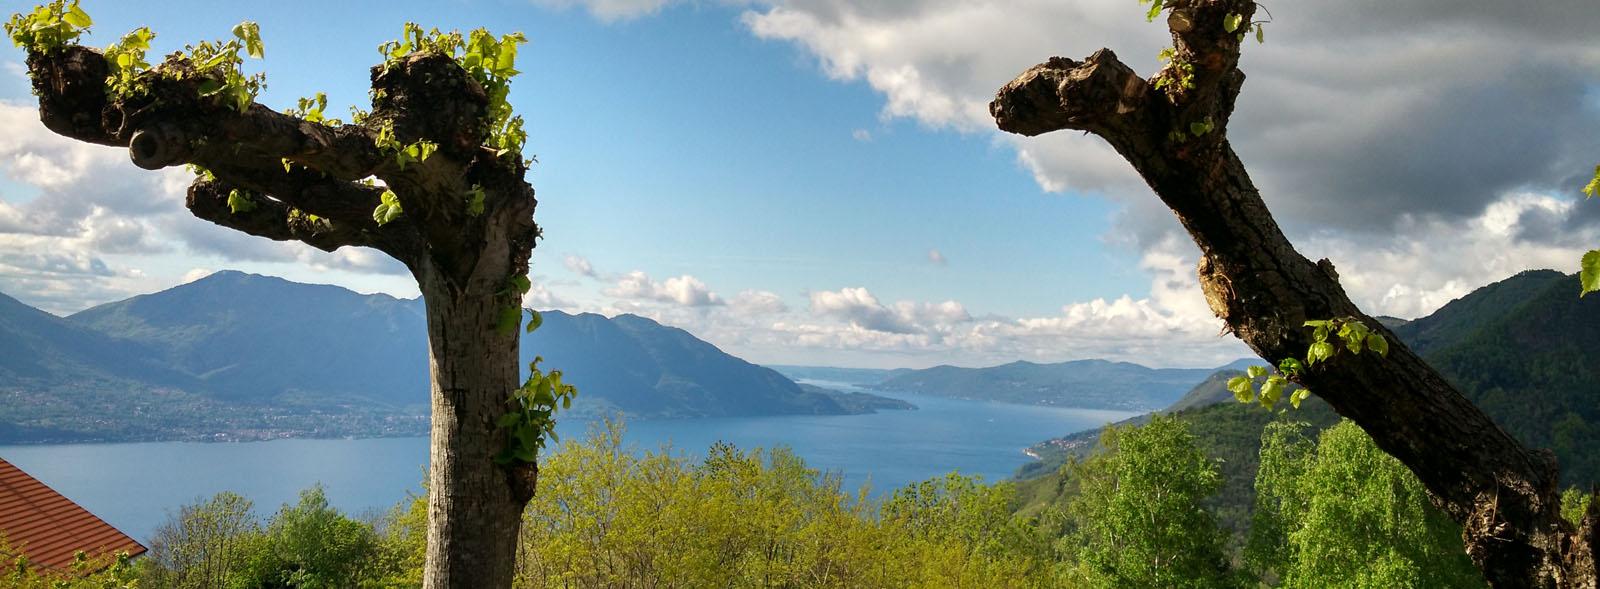 Trarego-Viggiona, Blick auf den See